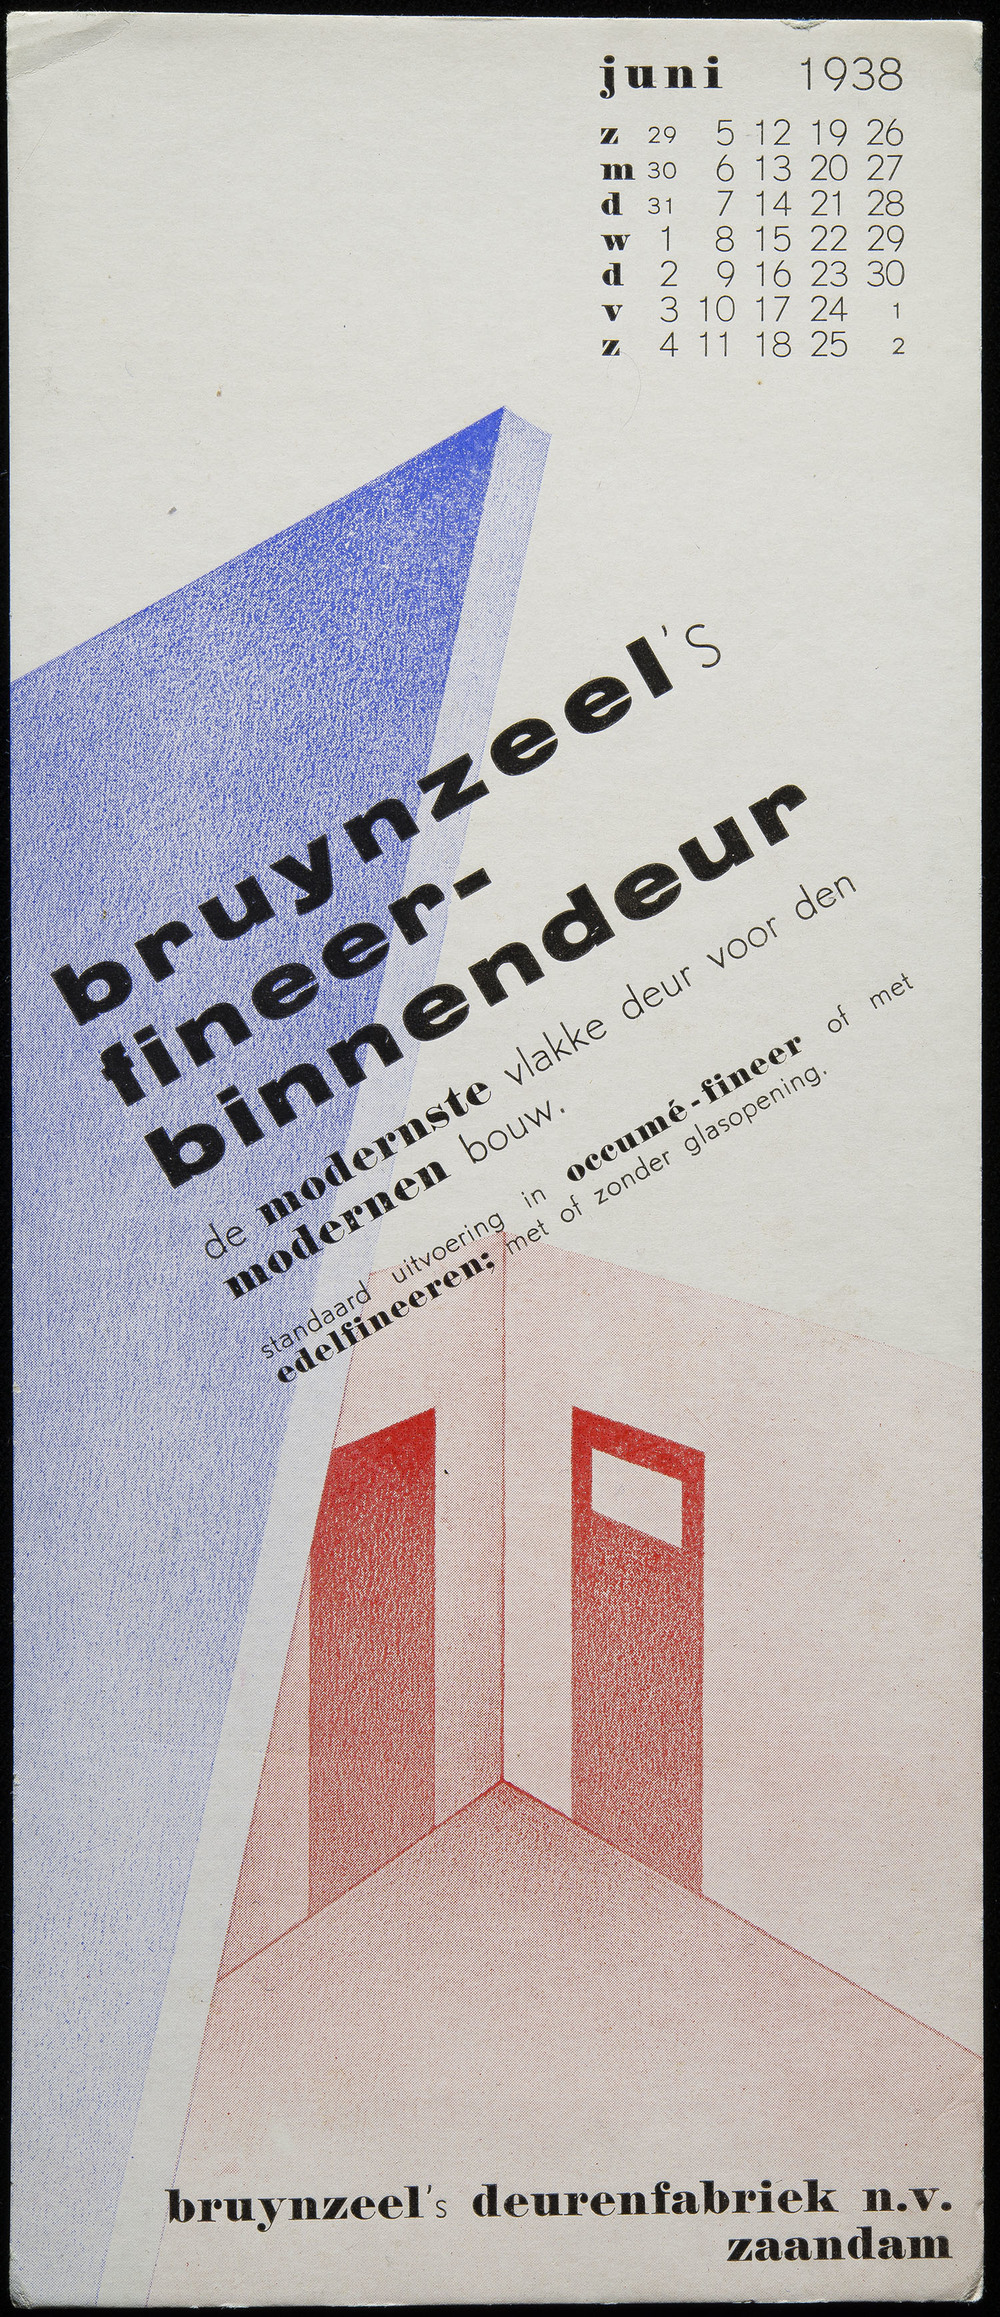 Piet Zwart, calendar blotter for Bruynzeel's Deurenfabriek, Zaandam, 1938, 9.5 x 21.8 cm